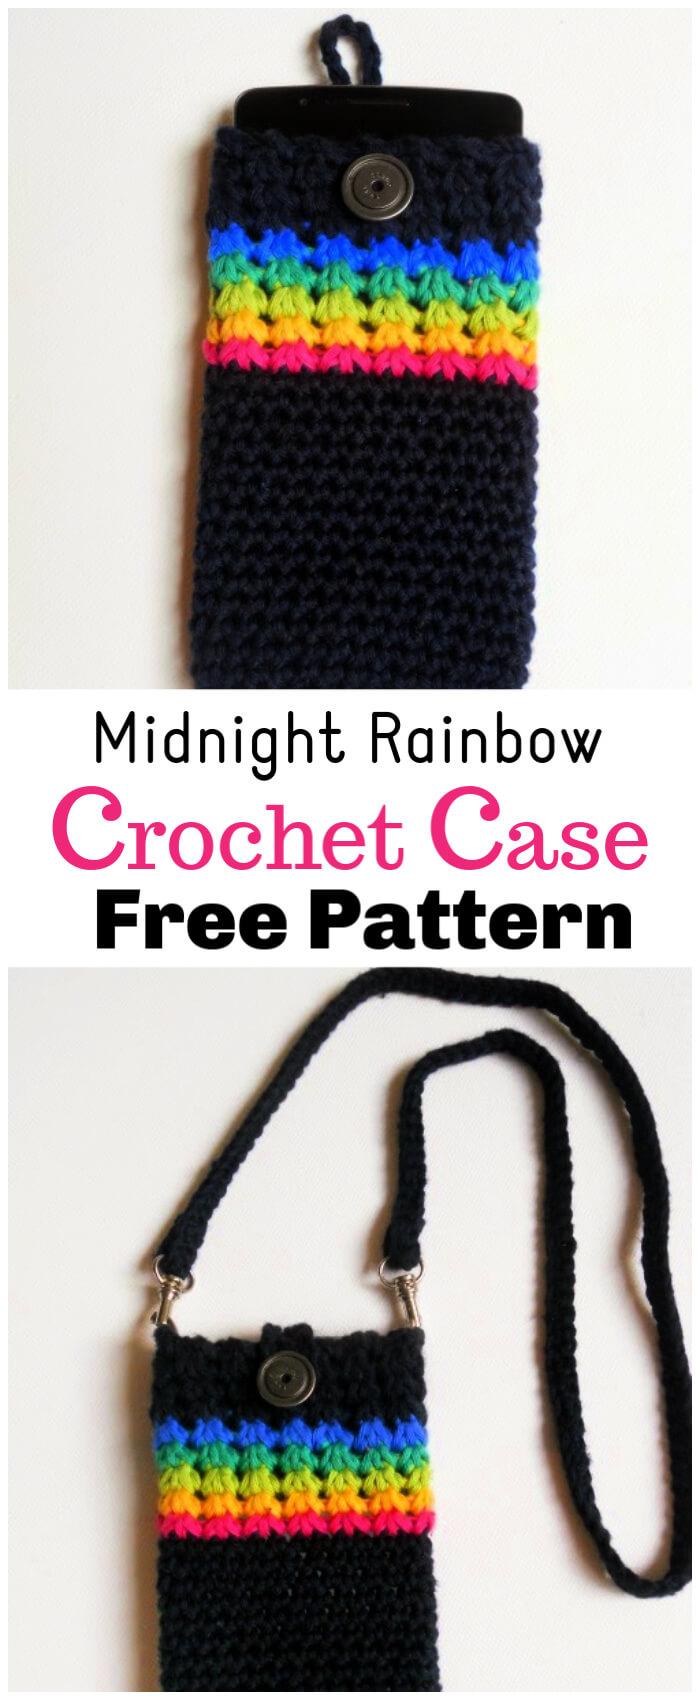 Crochet Midnight Rainbow Phone Cover Free Pattern